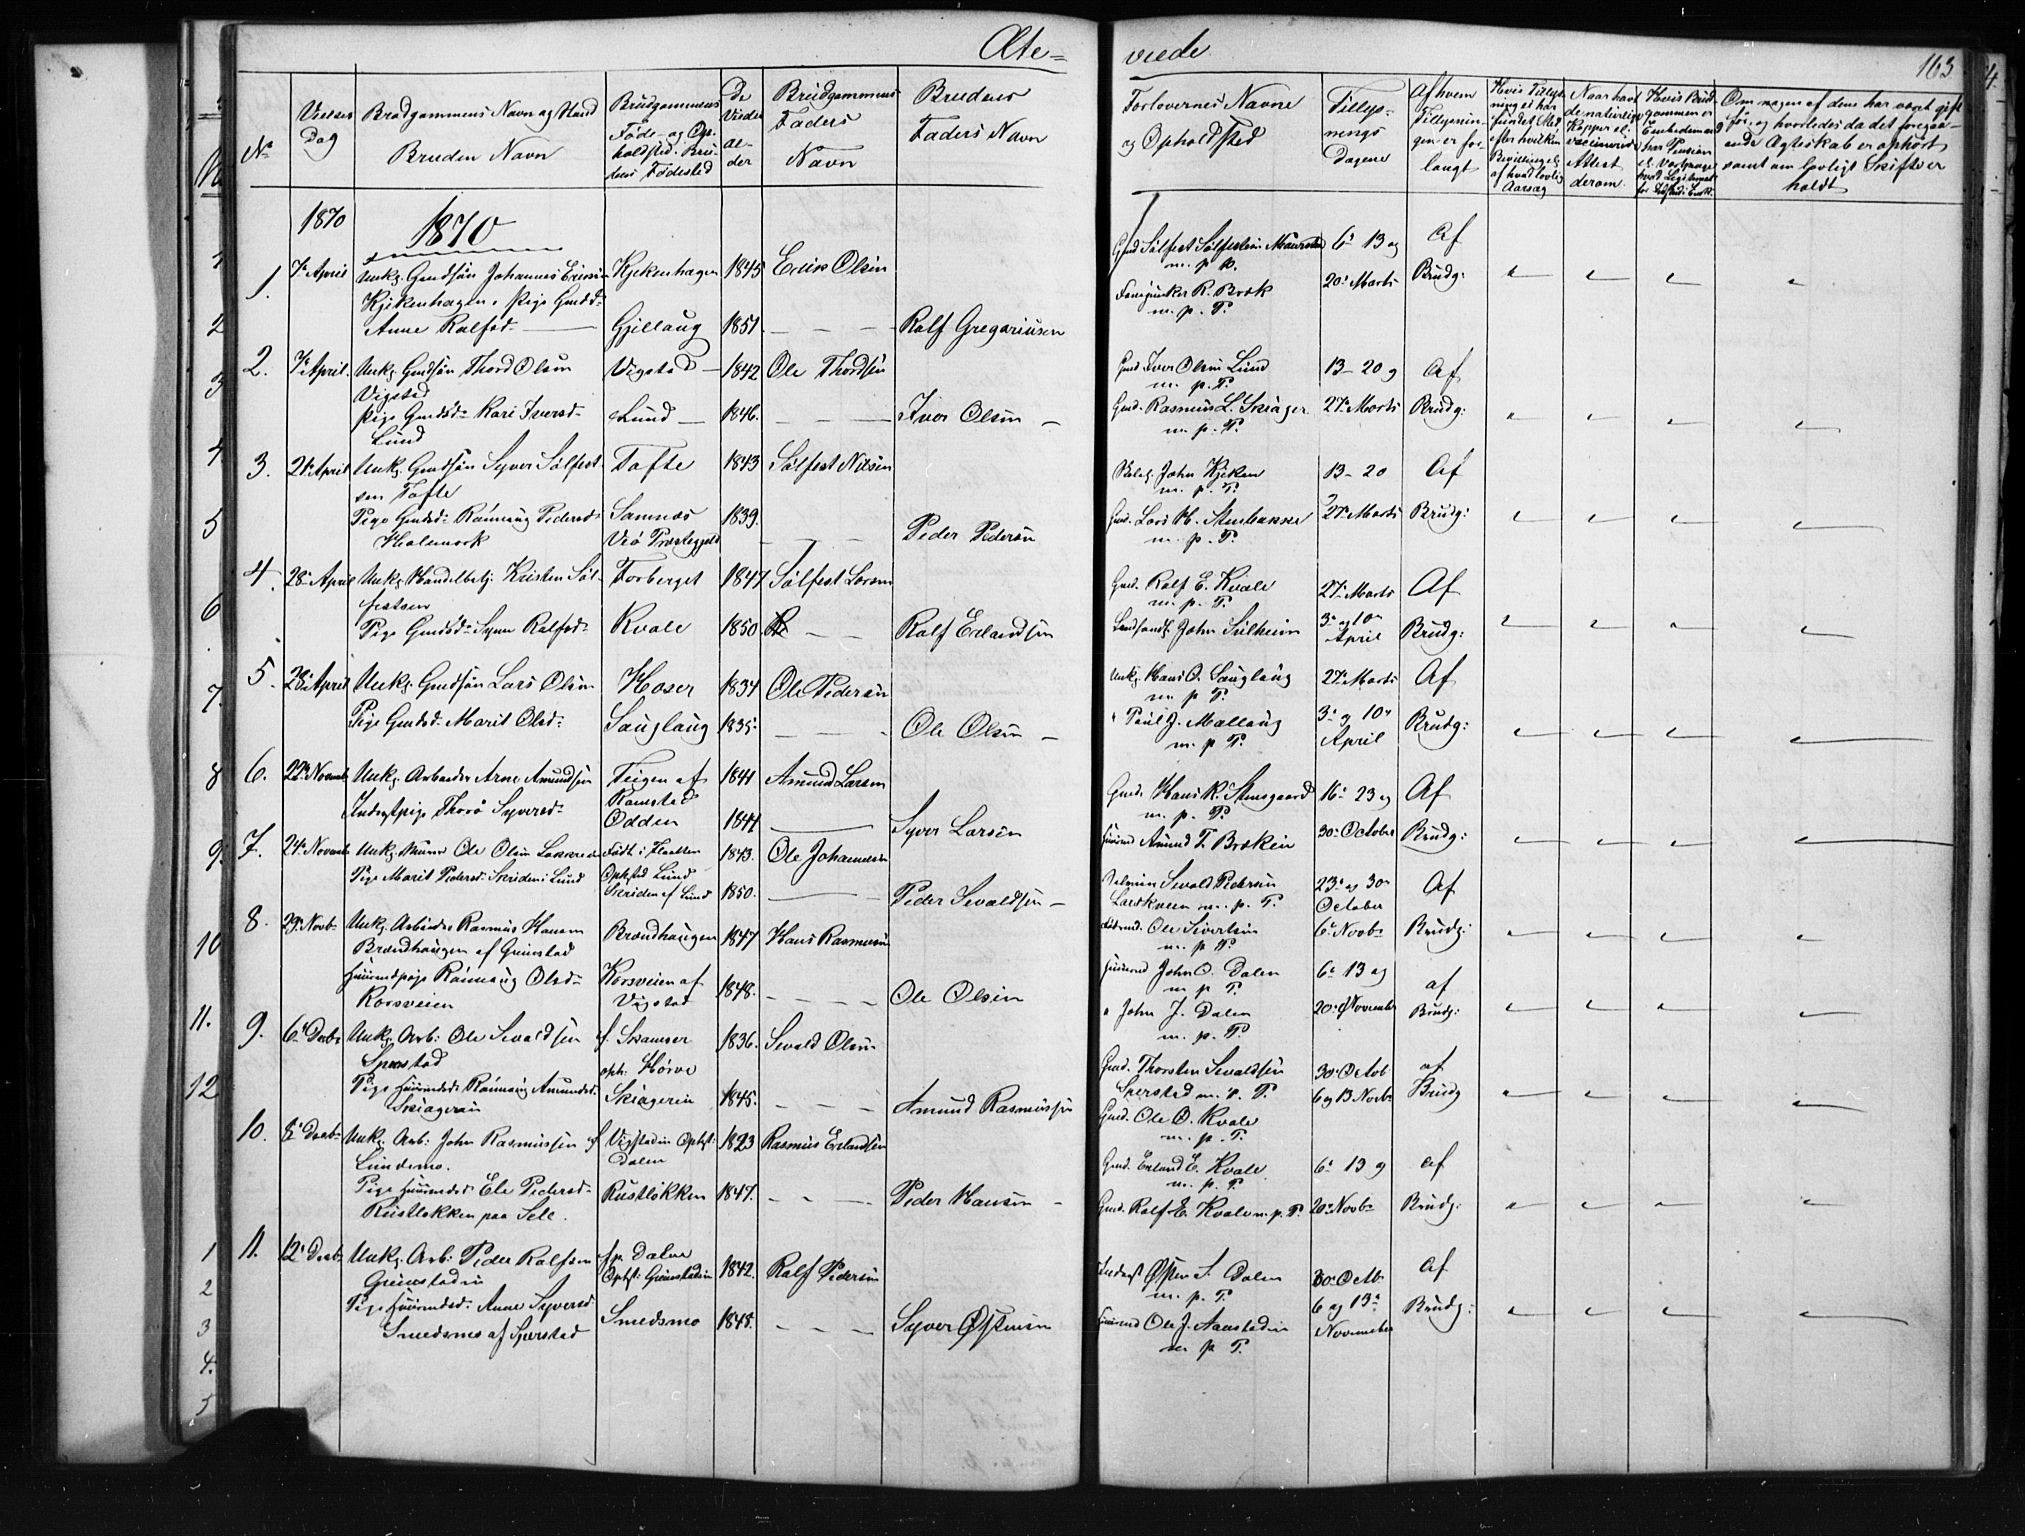 SAH, Skjåk prestekontor, Klokkerbok nr. 1, 1865-1893, s. 163